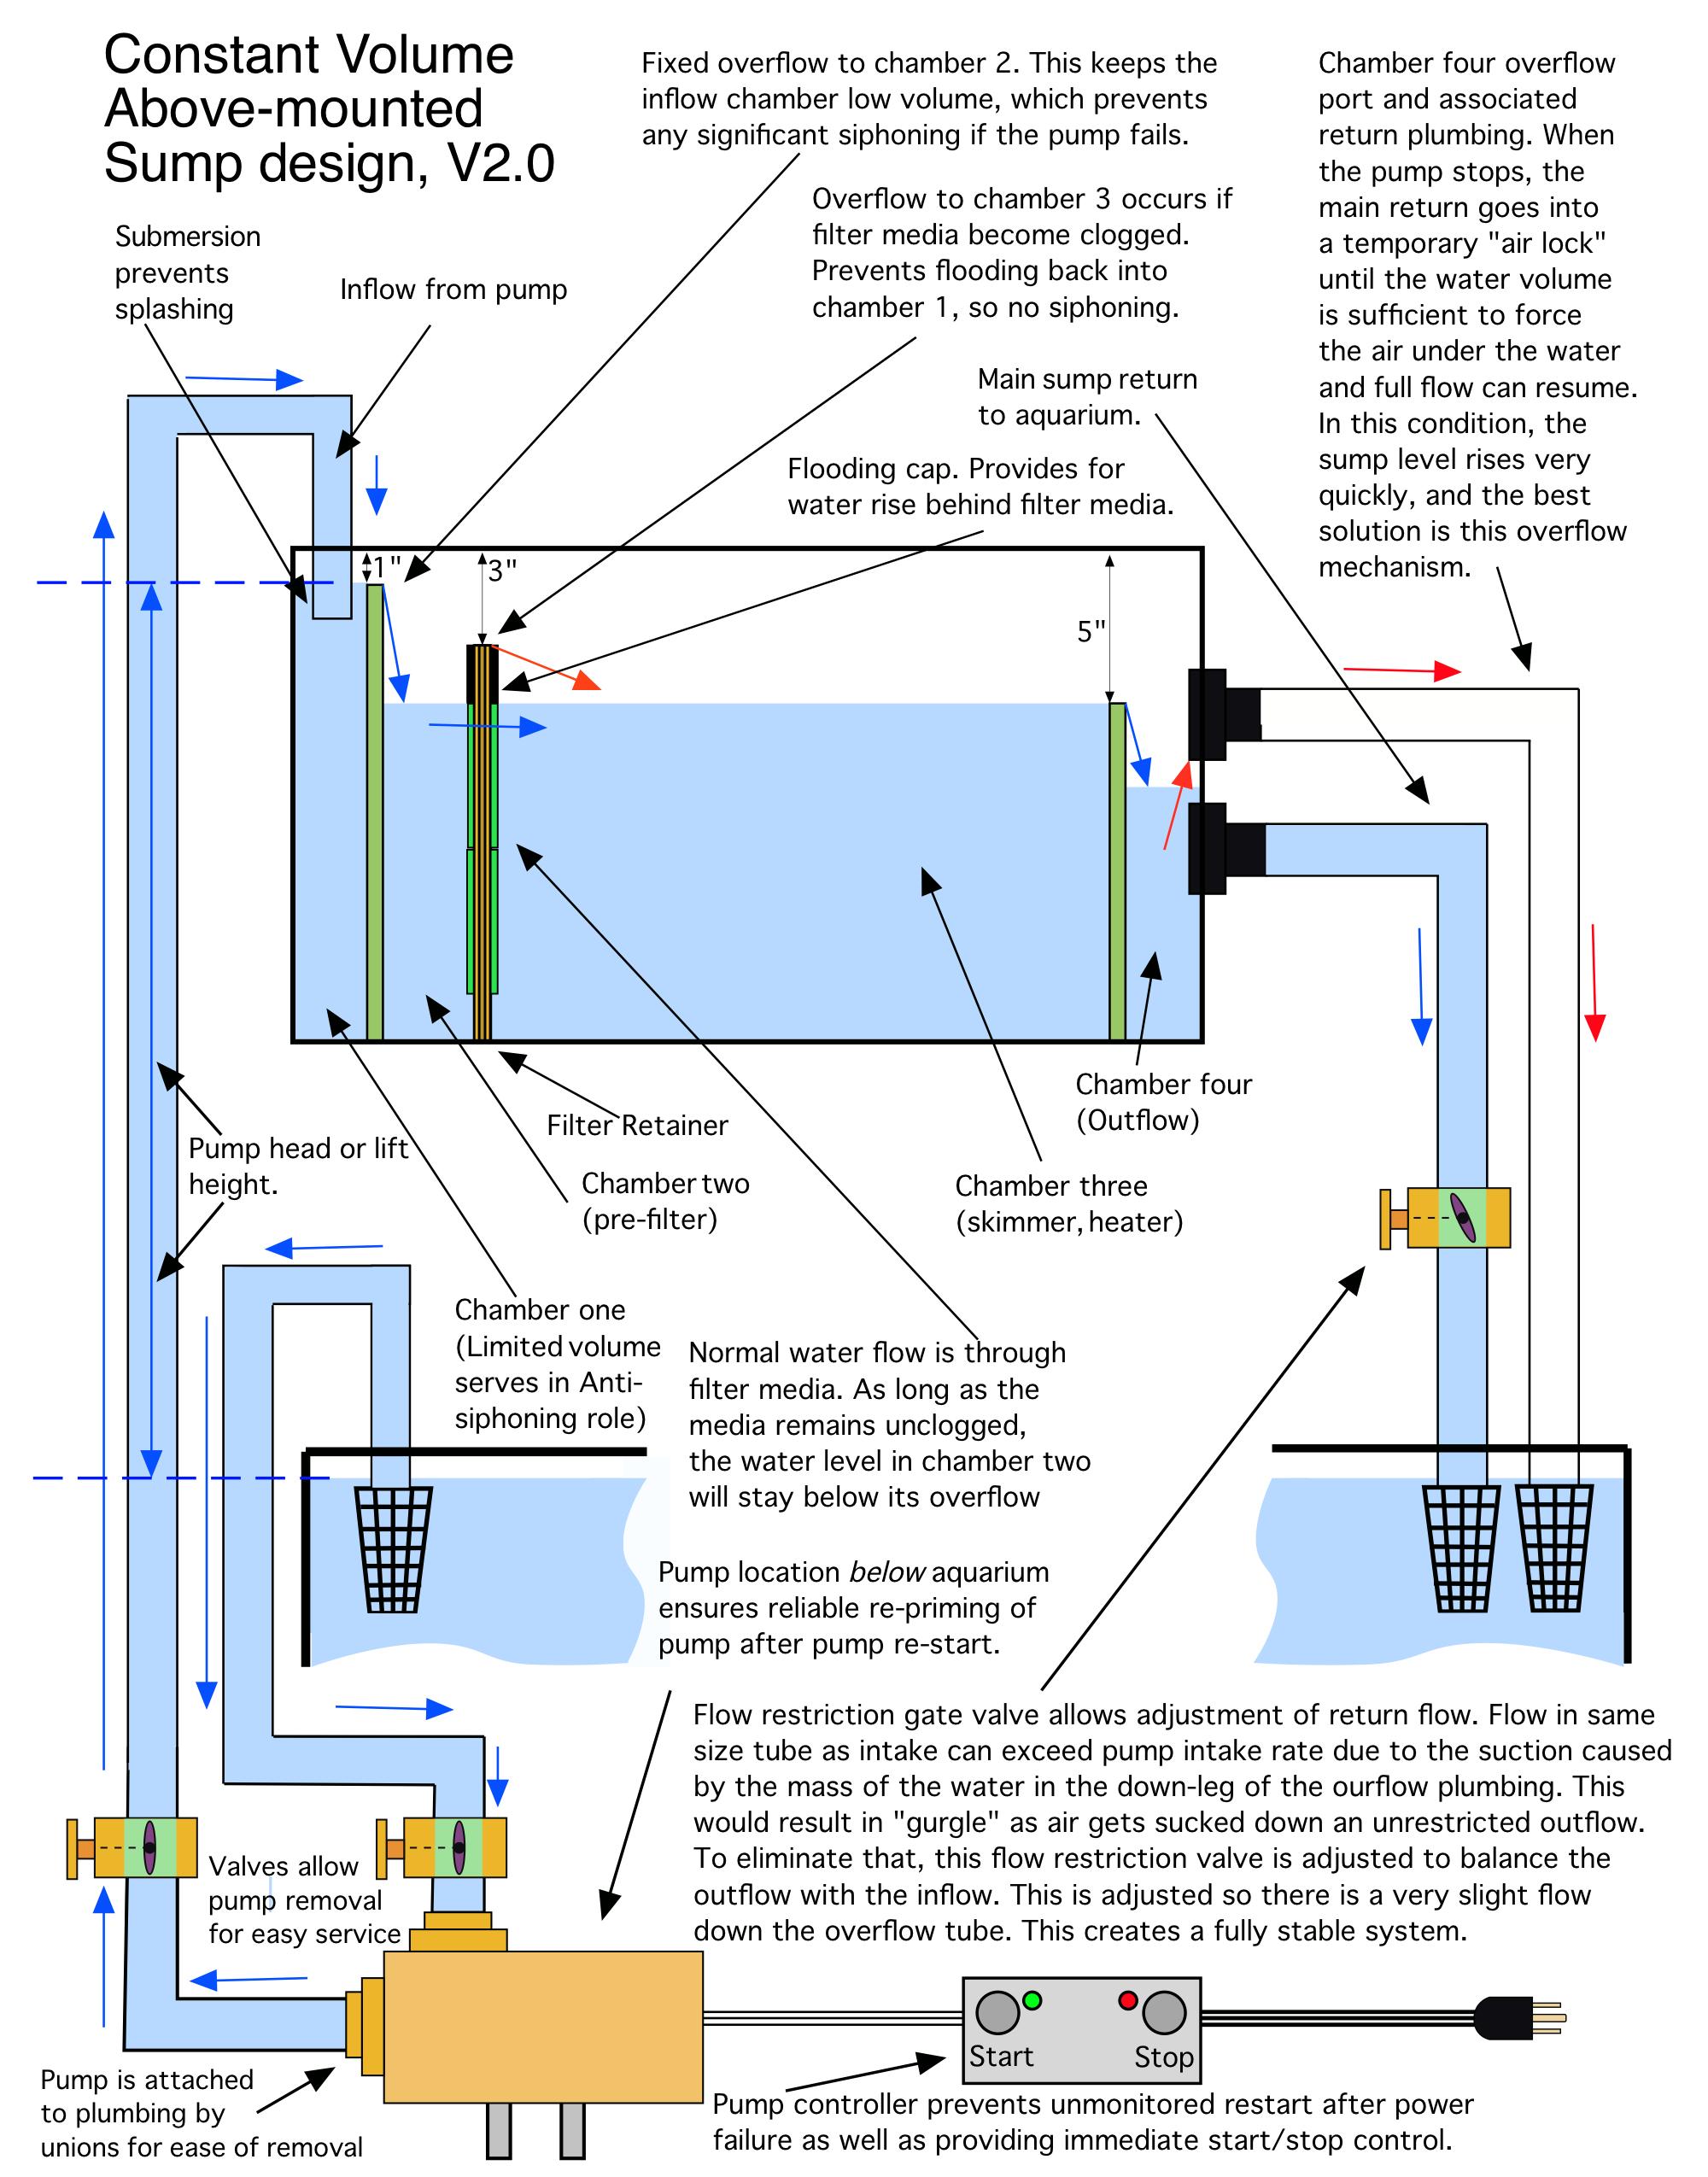 ded book guide wter heter nz plumbing pdf services design tnkless engineering